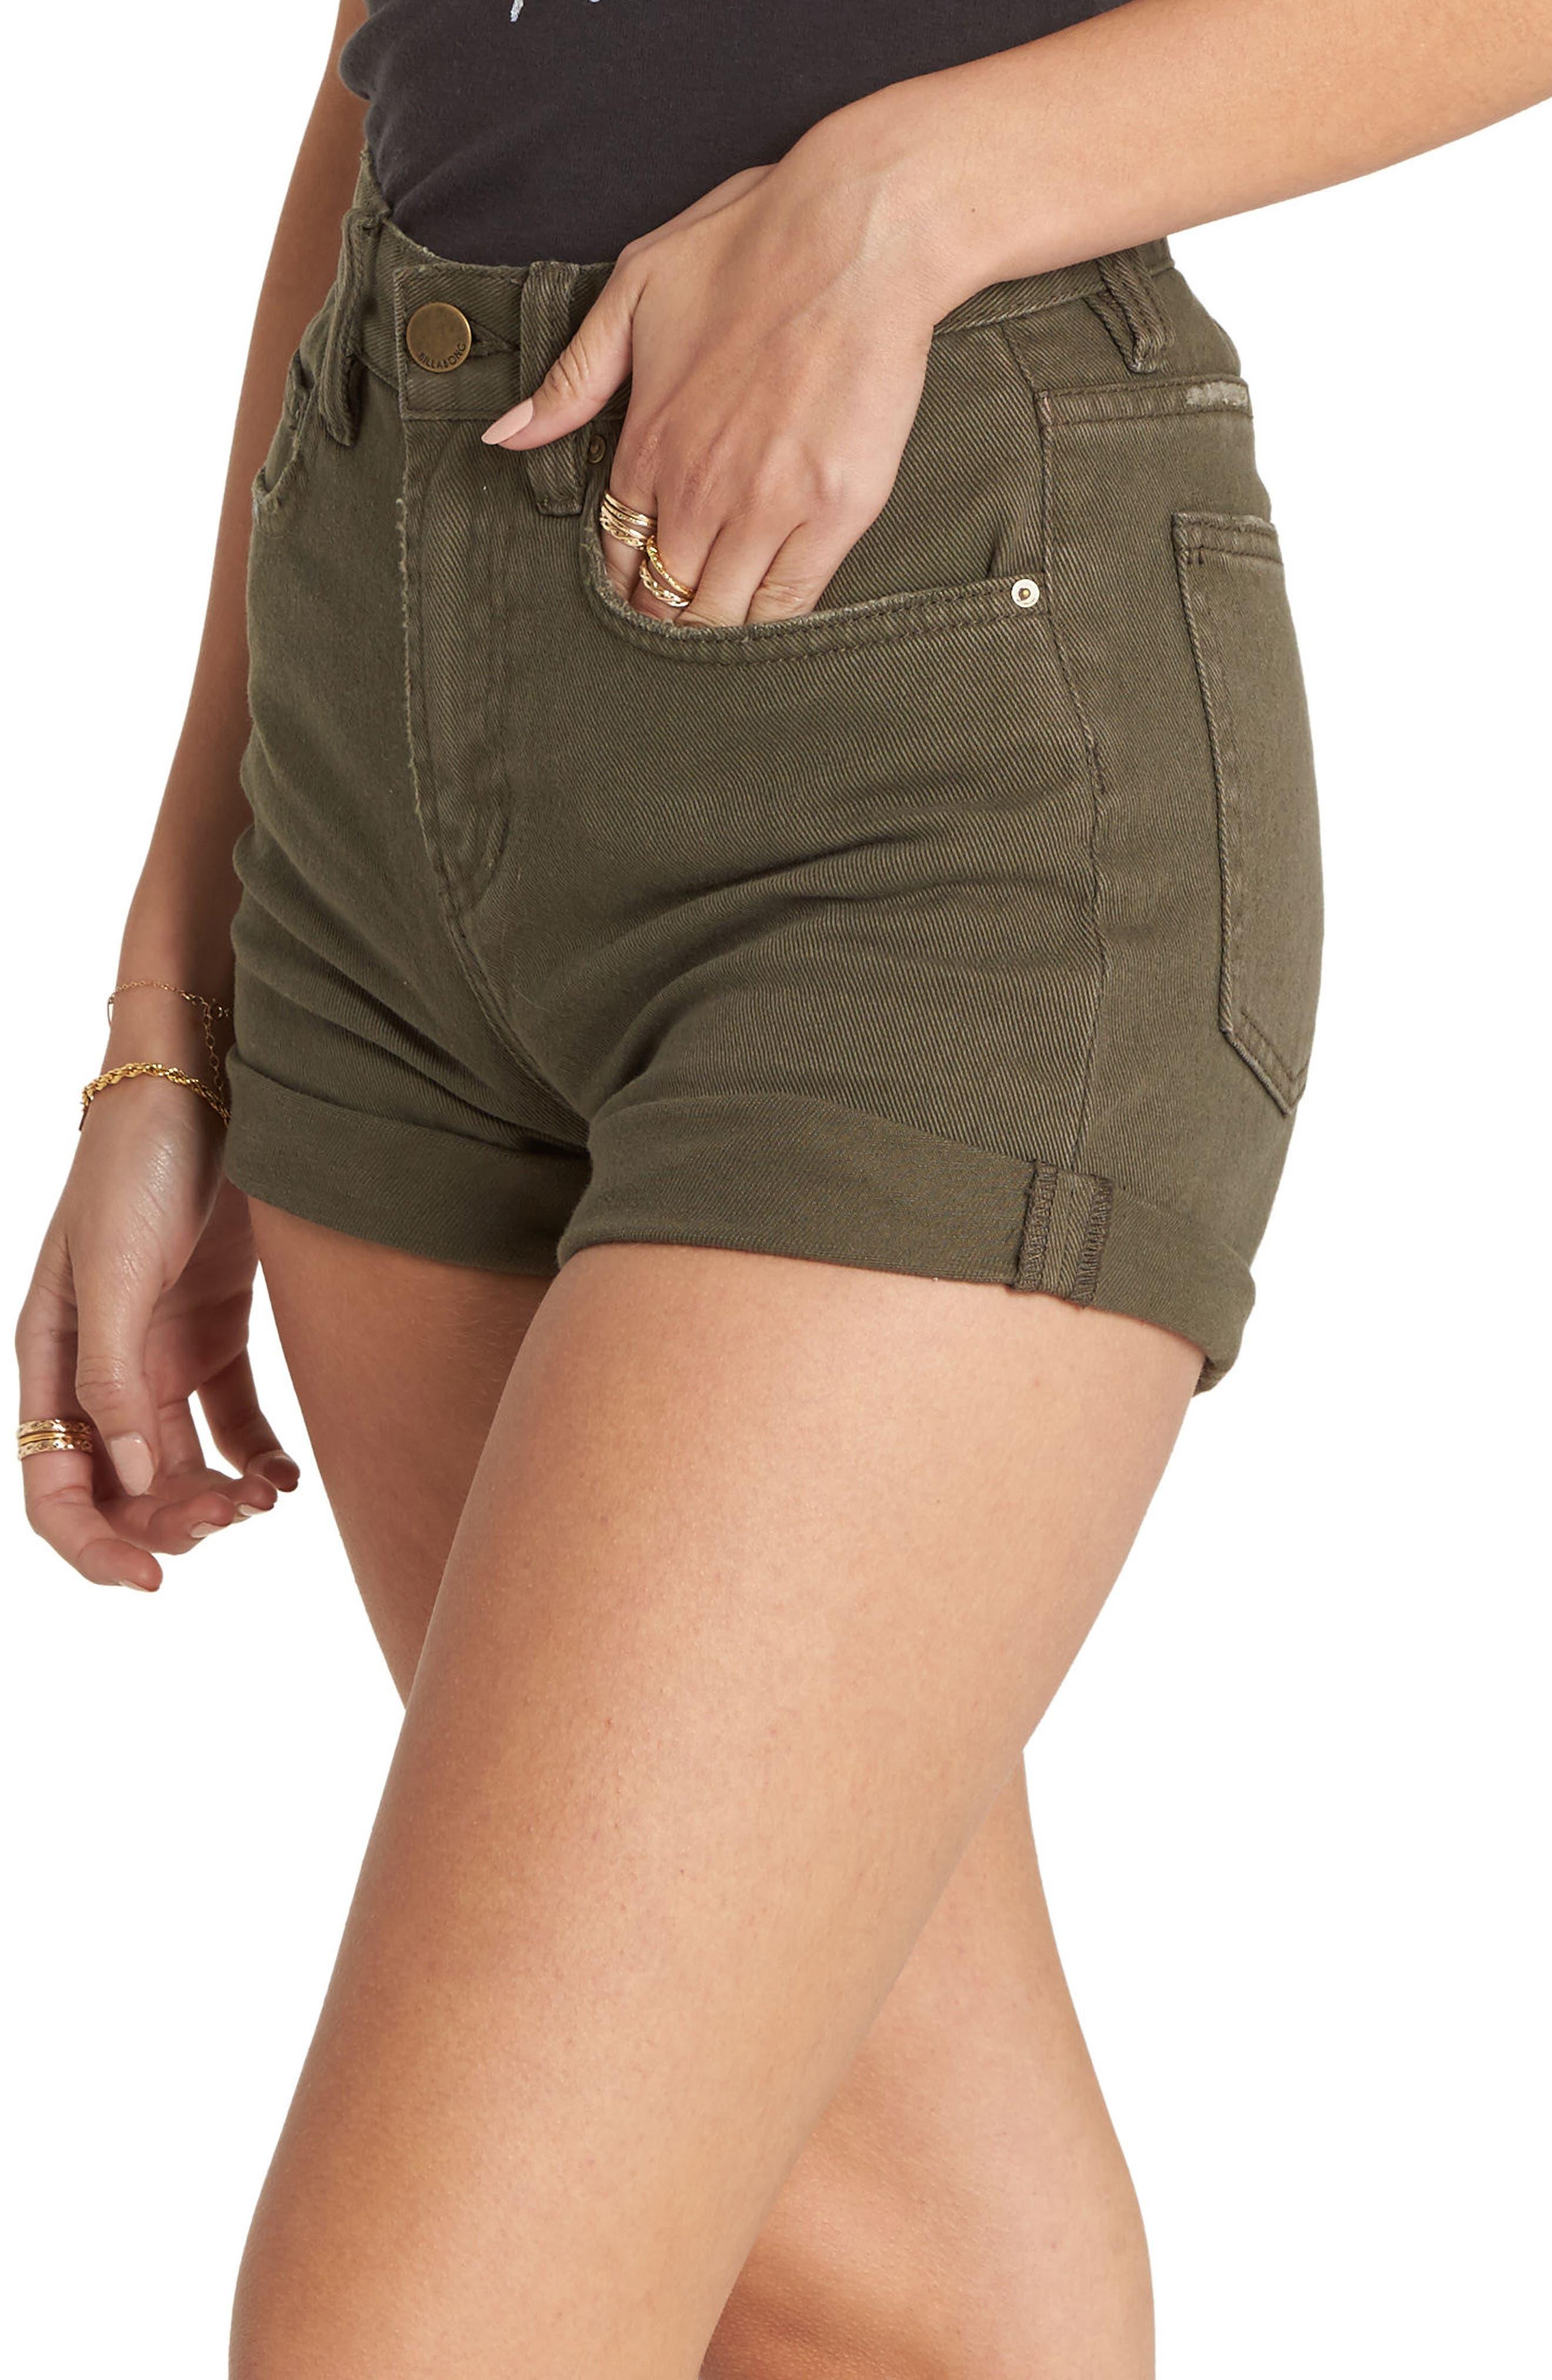 High Tide Denim Shorts,                             Alternate thumbnail 3, color,                             Olive